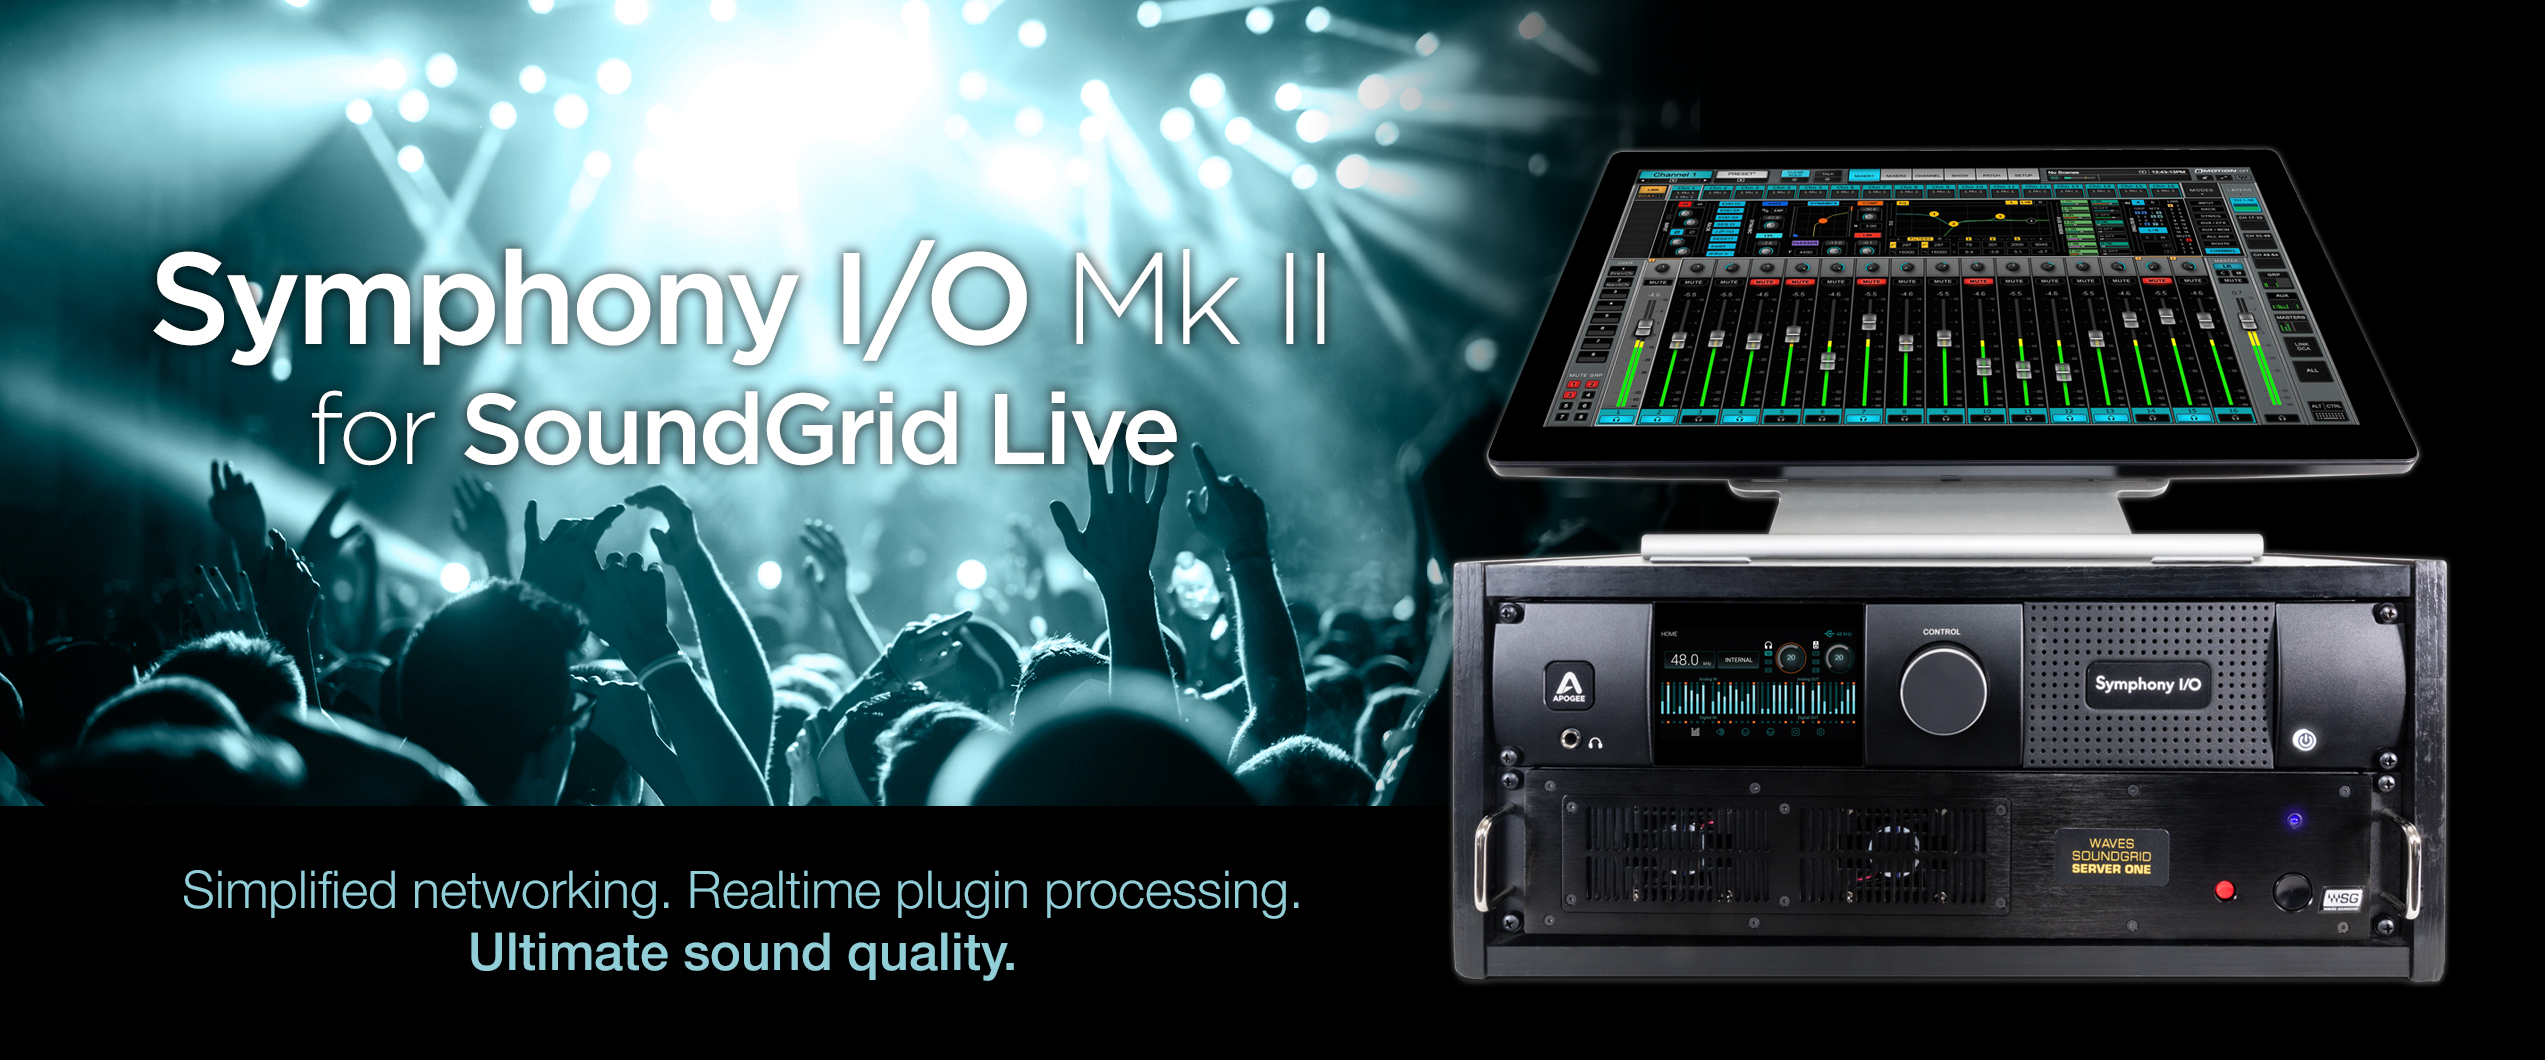 Symphony I/O MK II for SoundGrid Live